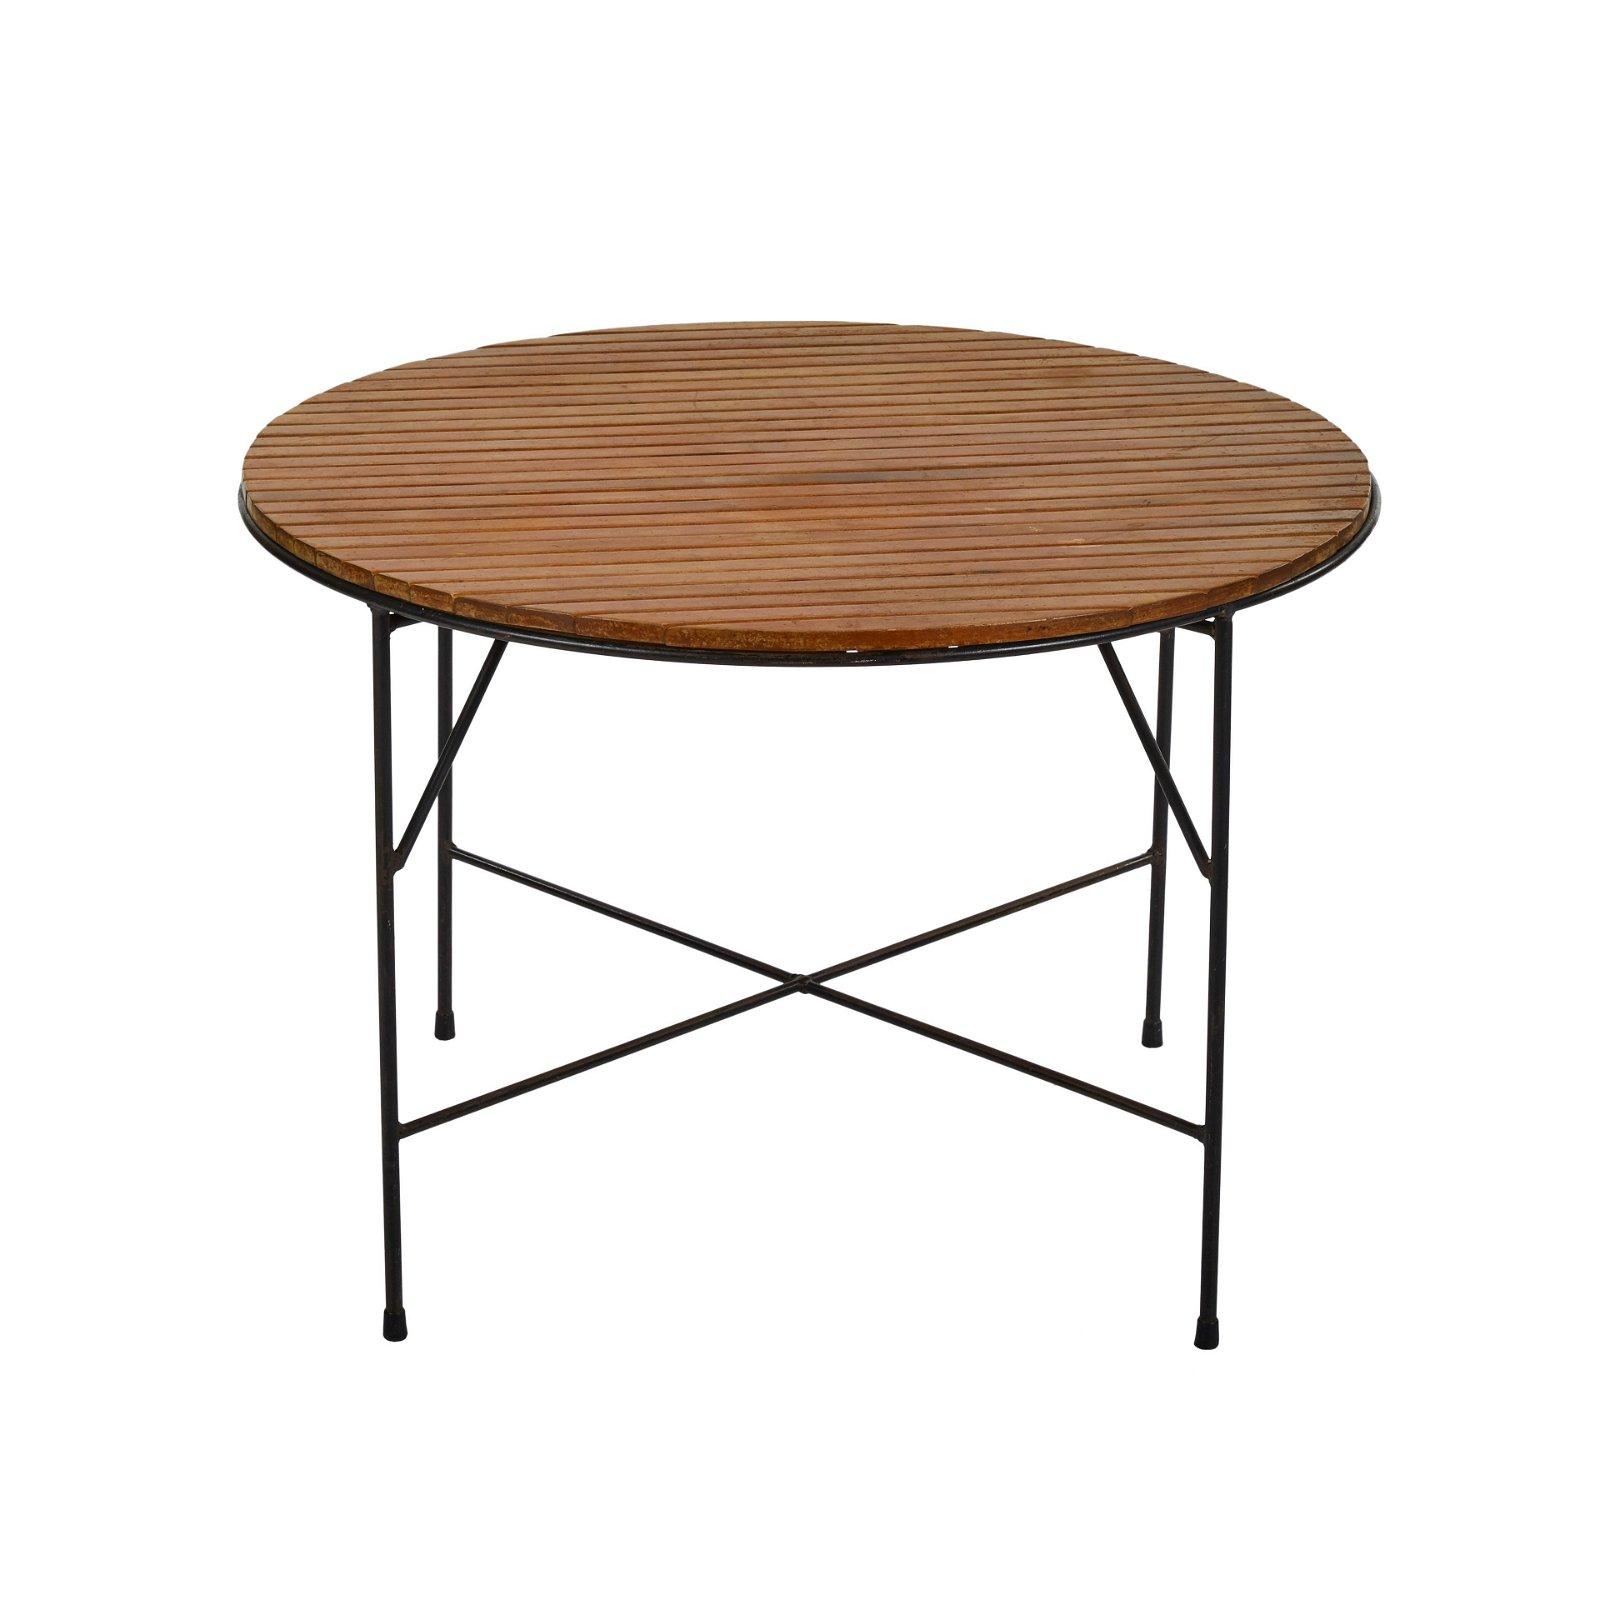 Arthur Umanoff Round Dining Table